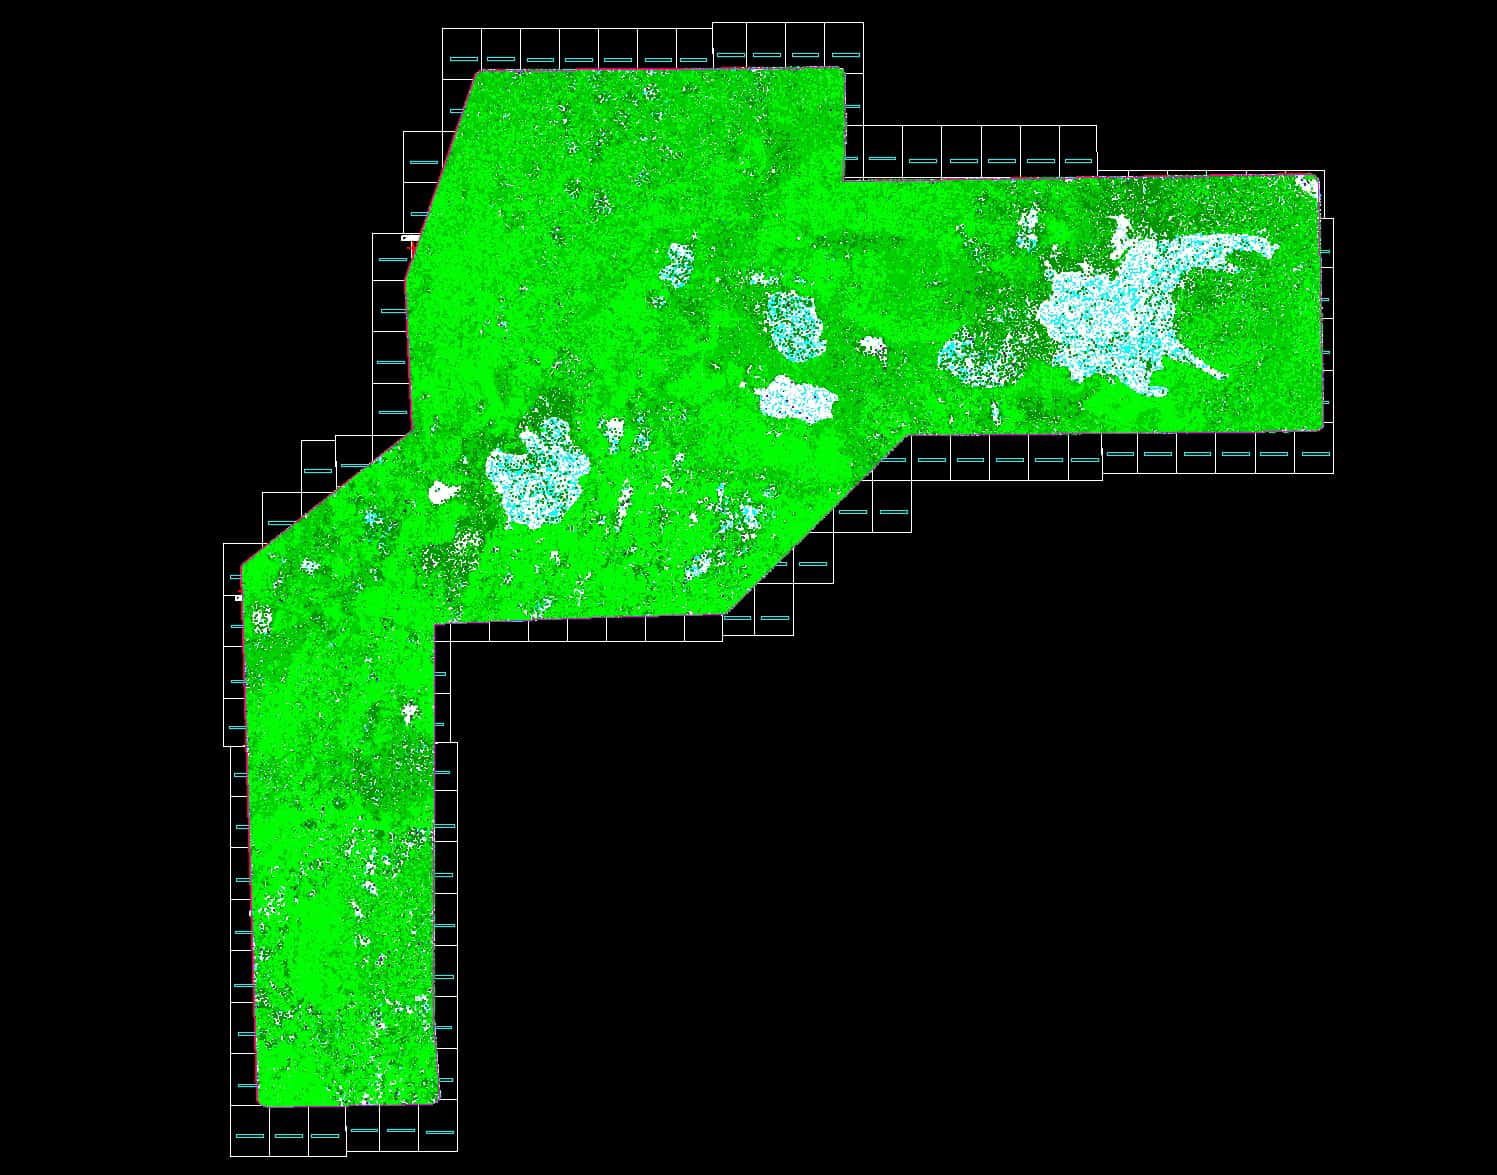 Digital Elevation Model Purposes